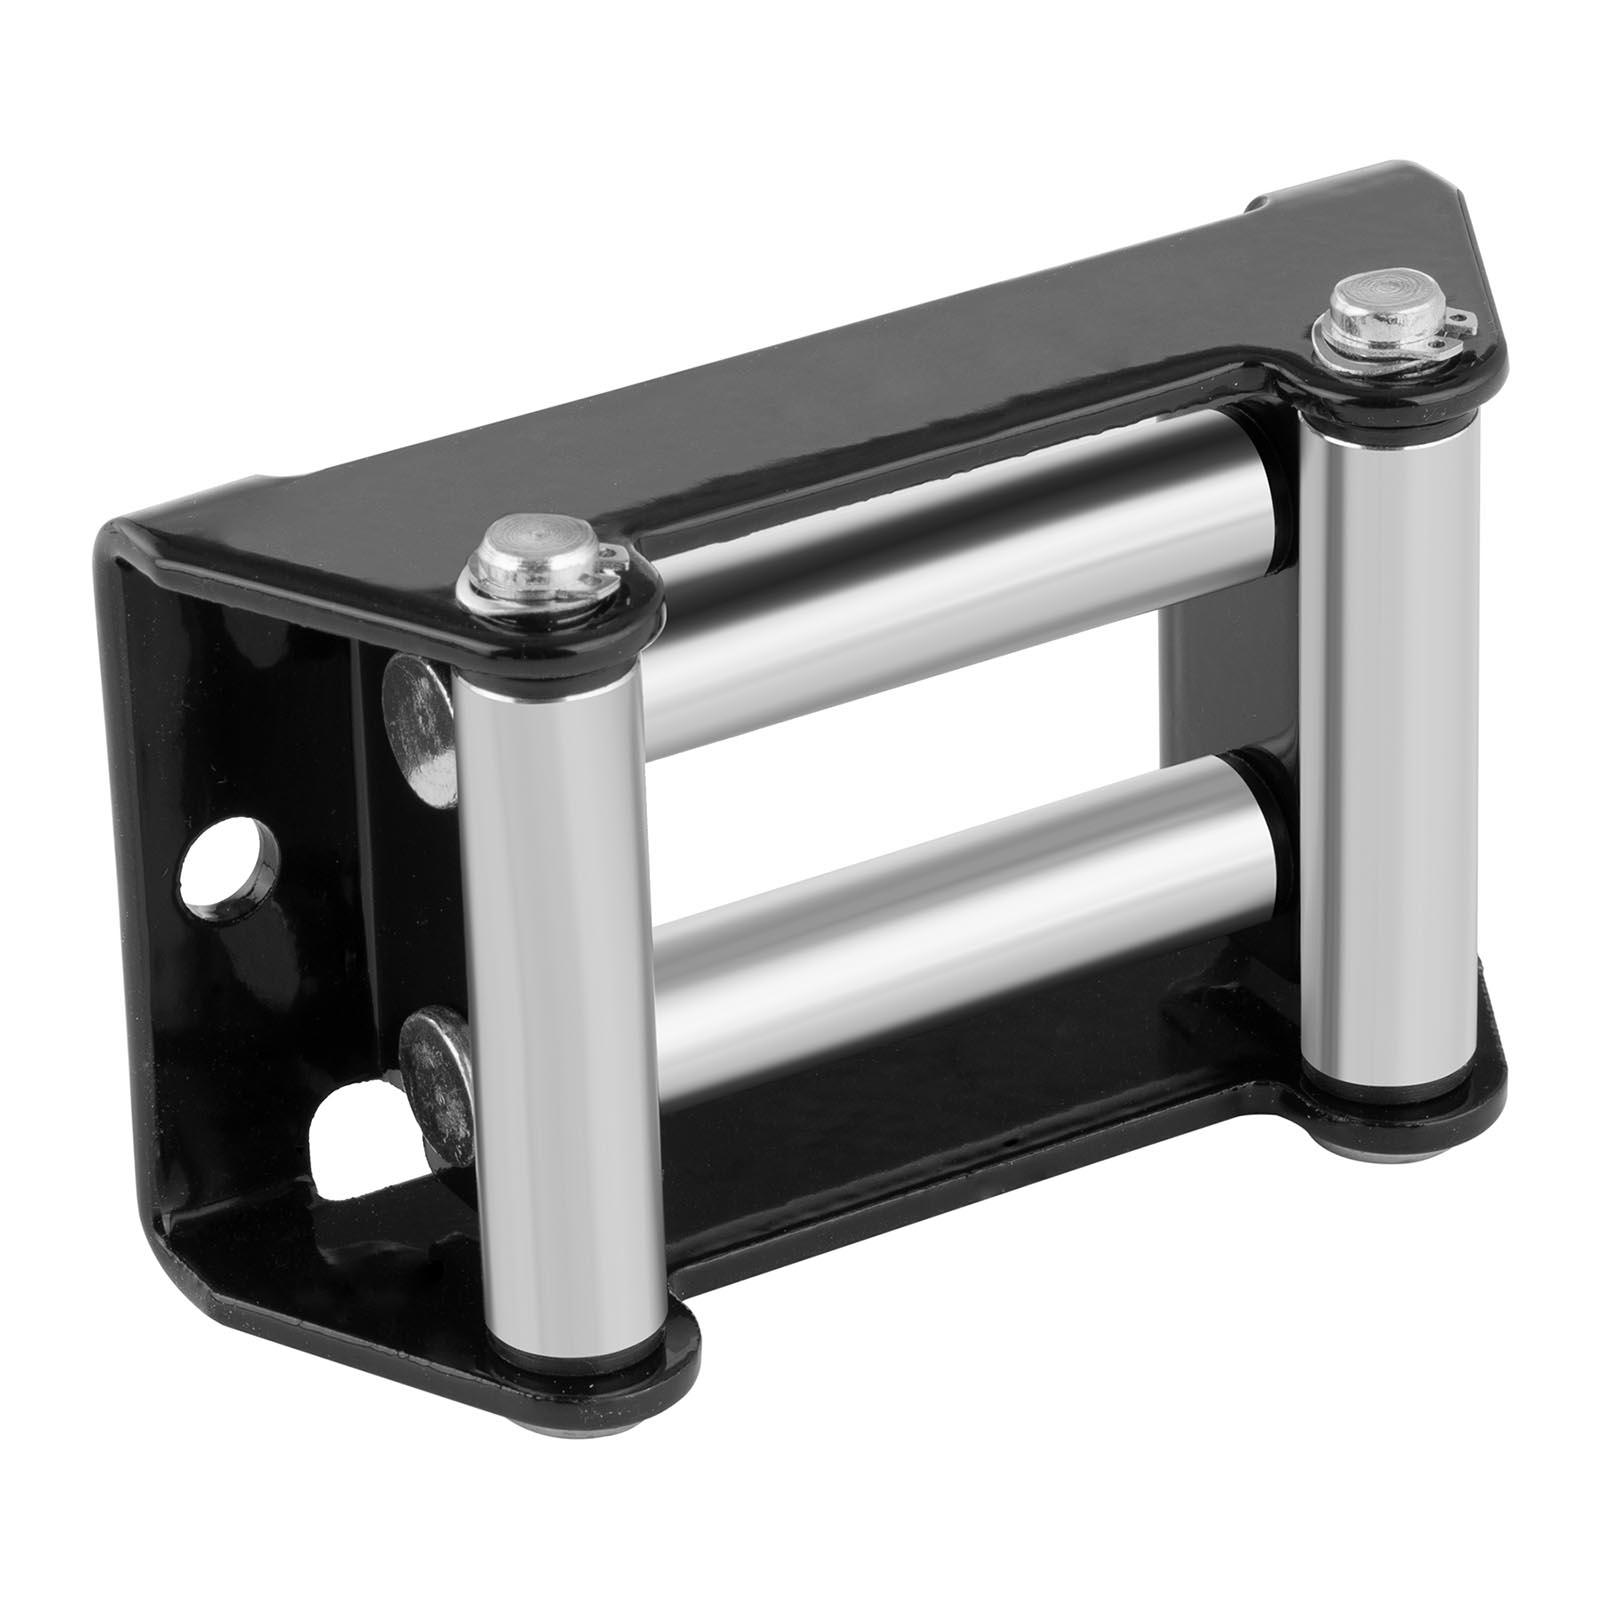 MSW Rollenfenster - 4 Rollen - bis 3.500 lbs/1.590 kg 10060184